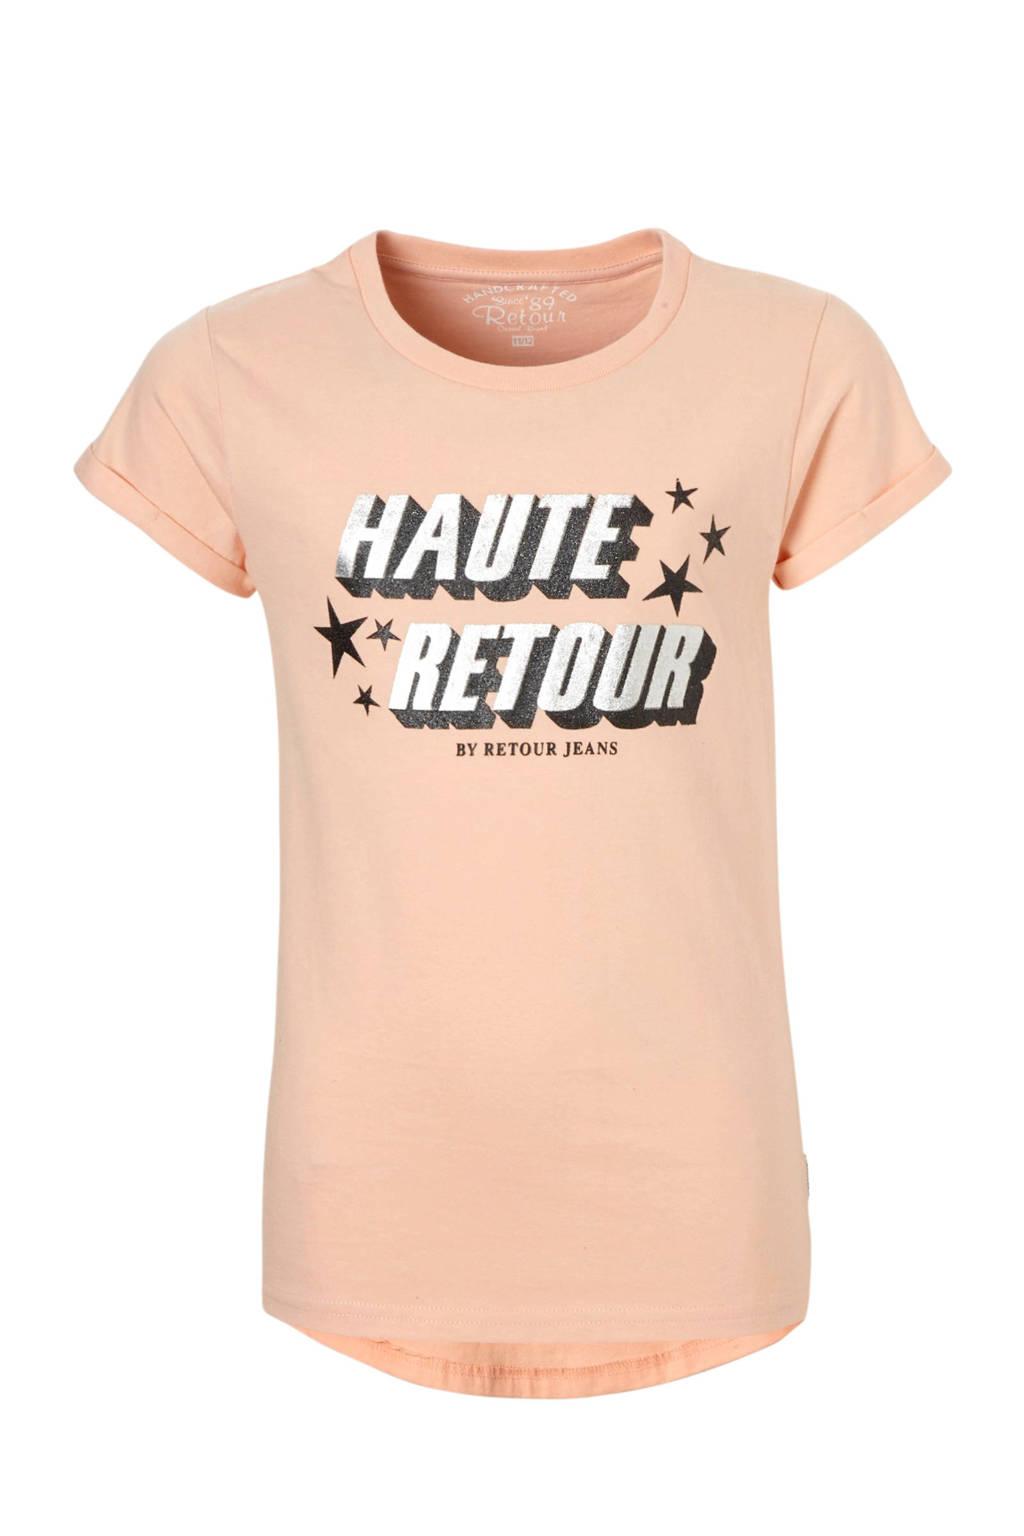 Retour Denim T-shirt met tekstprint Robyn zalmroze, Zalmroze